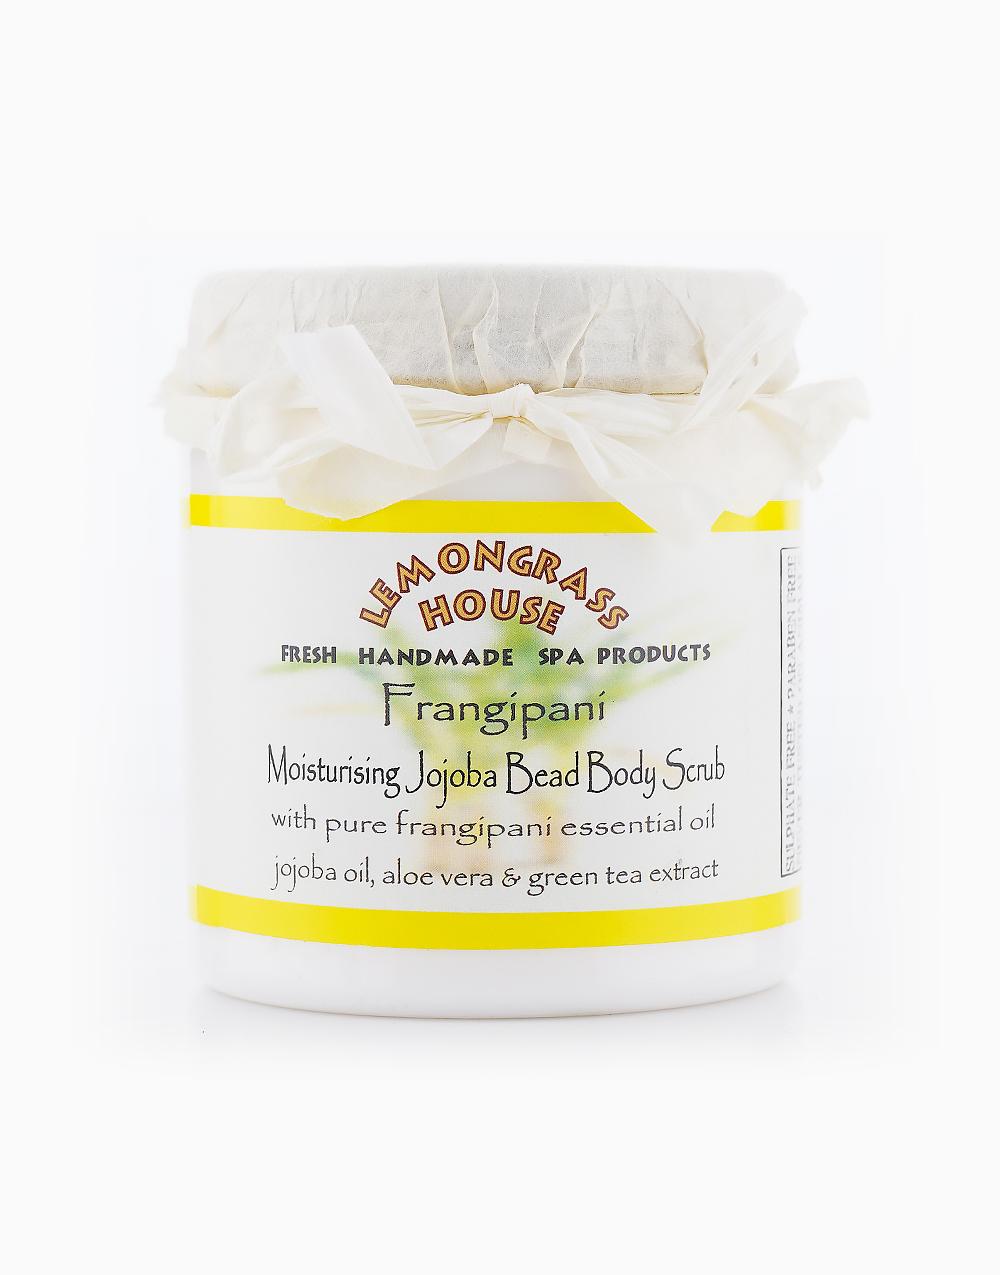 Frangipani Moisturising Jojoba Bead Body Scrub (300g) by Lemongrass House